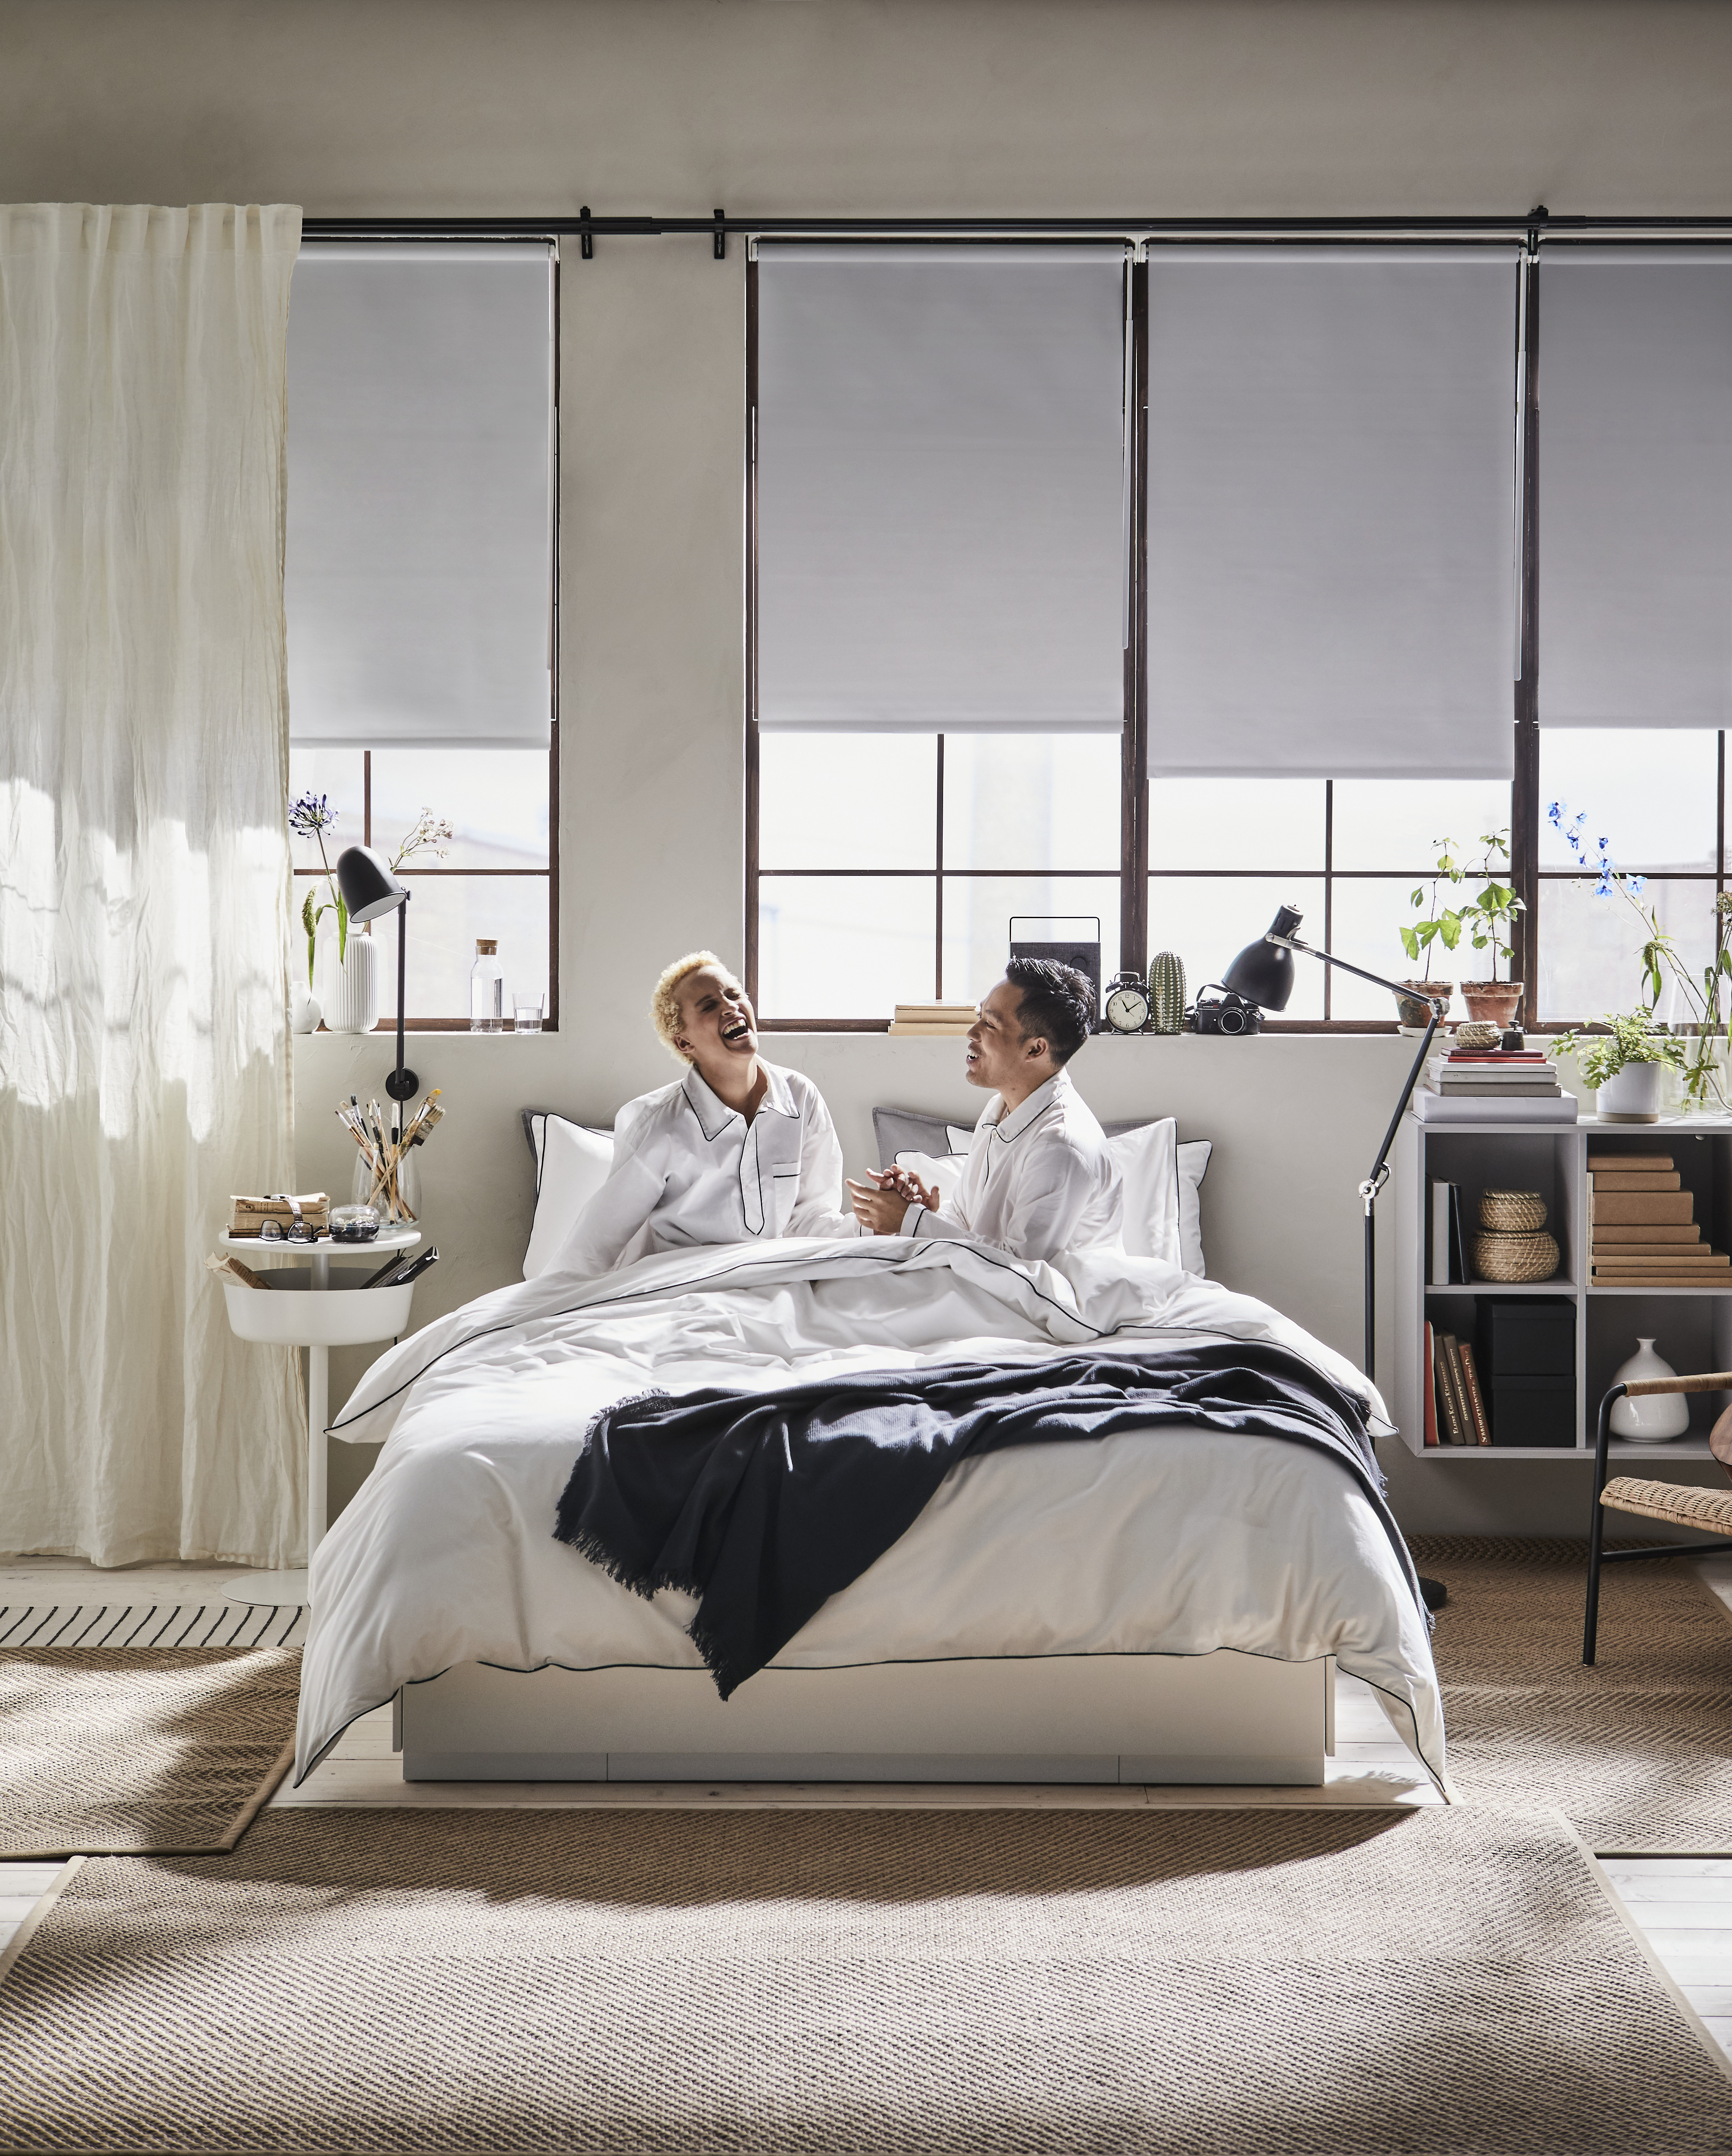 IKEA, , Bed frame, Bedroom, Catalog, Mattress, IKEA Catalogue, Watching, Bed Sheets, Bed, bed frame, Bed, Bedroom, Furniture, Bed sheet, Room, Bed frame, Bedding, Interior design, Comfort, Textile